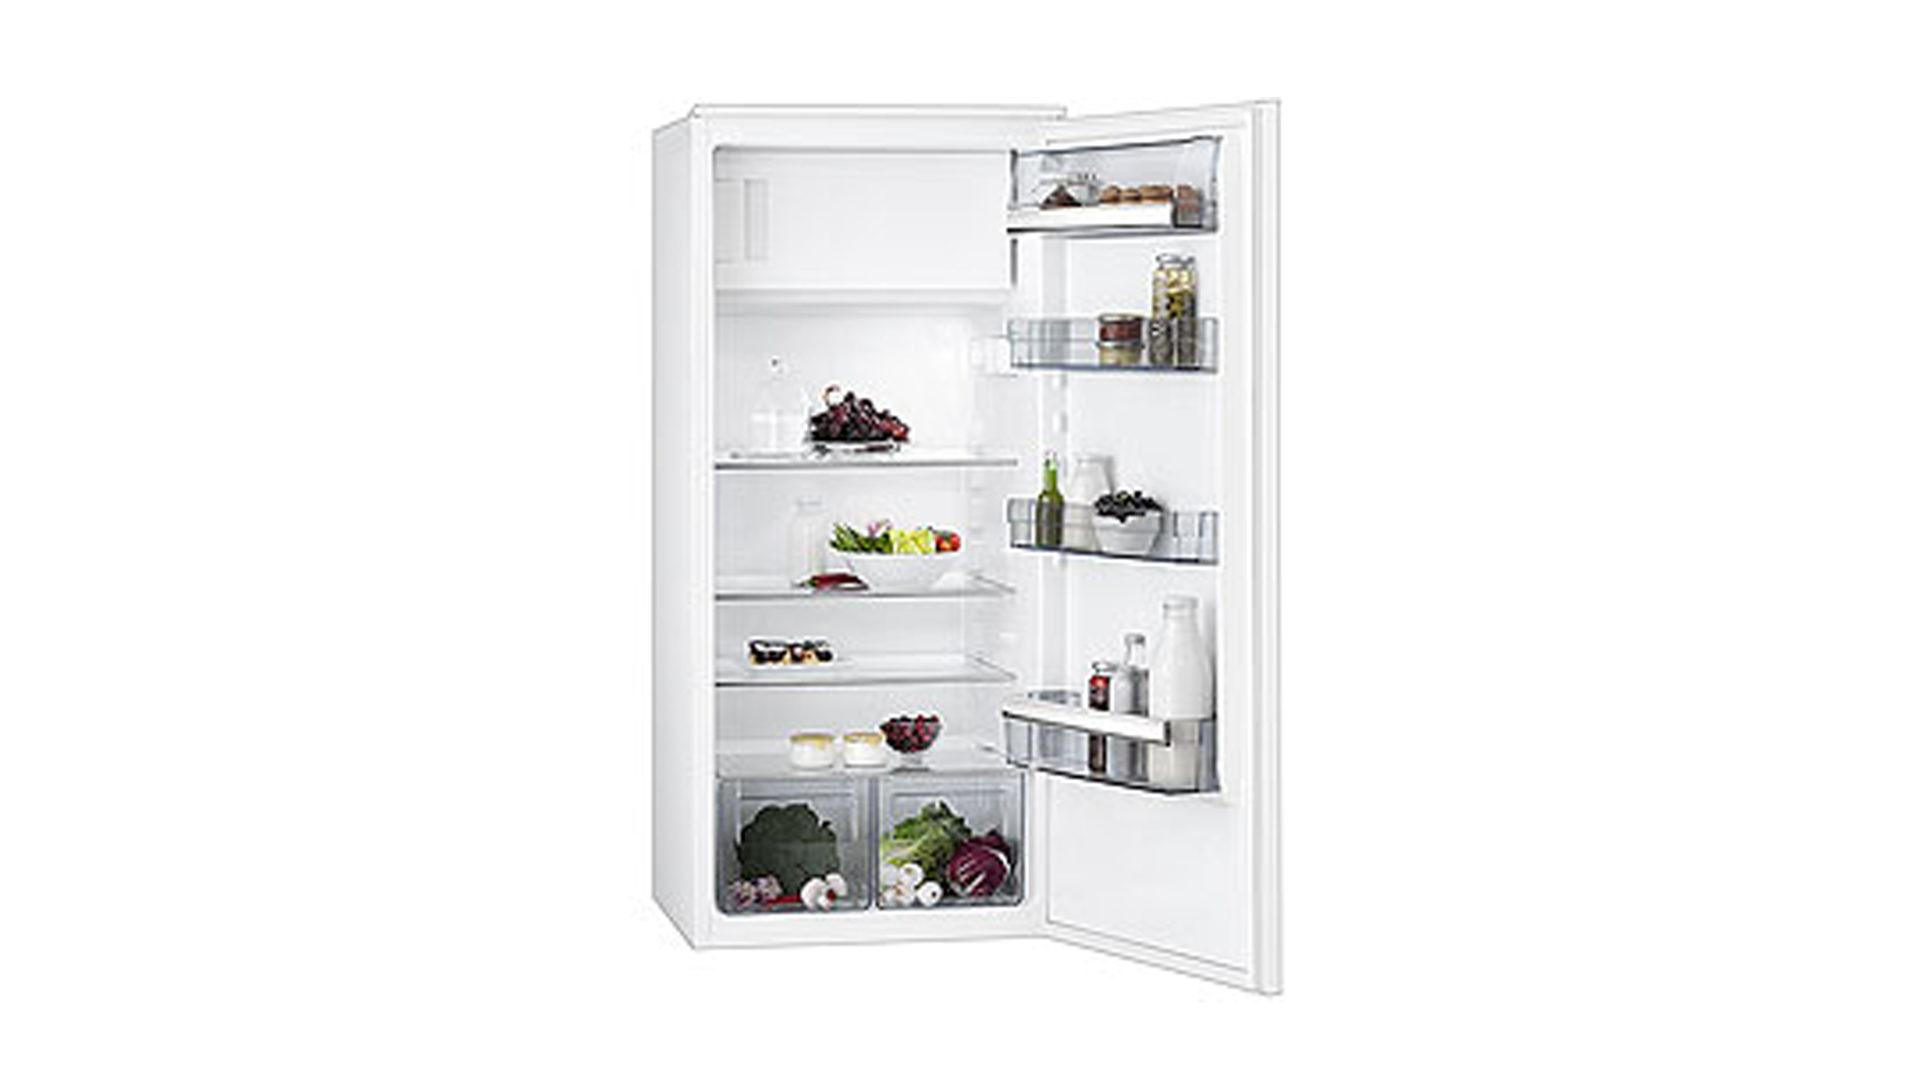 Aeg Electrolux Kühlschrank : Wohnland breitwieser markenshops kühlschränke aeg aeg